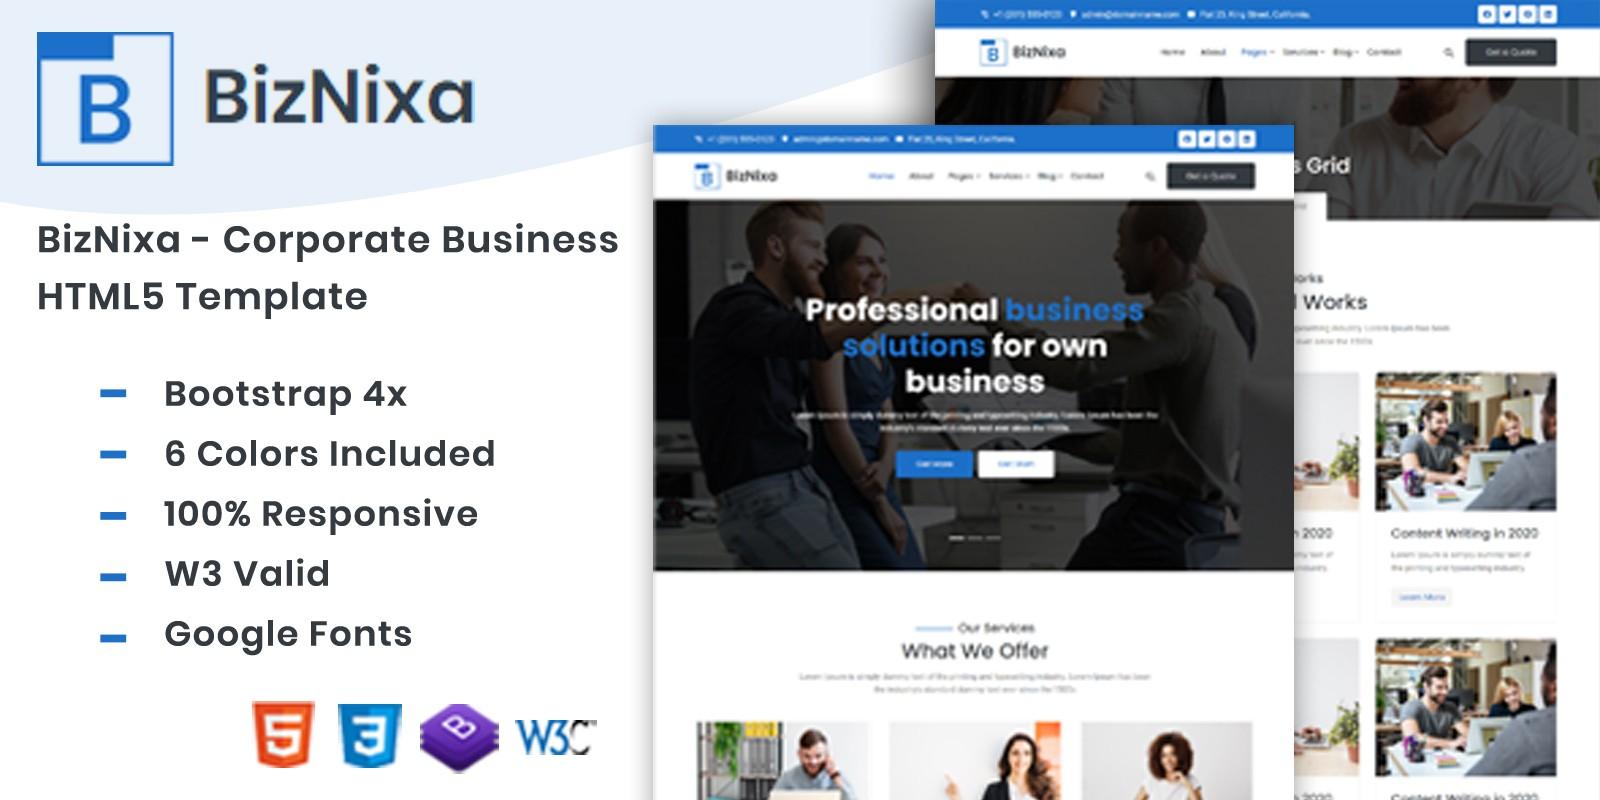 BizNixa - Corporate Business HTML5 Template